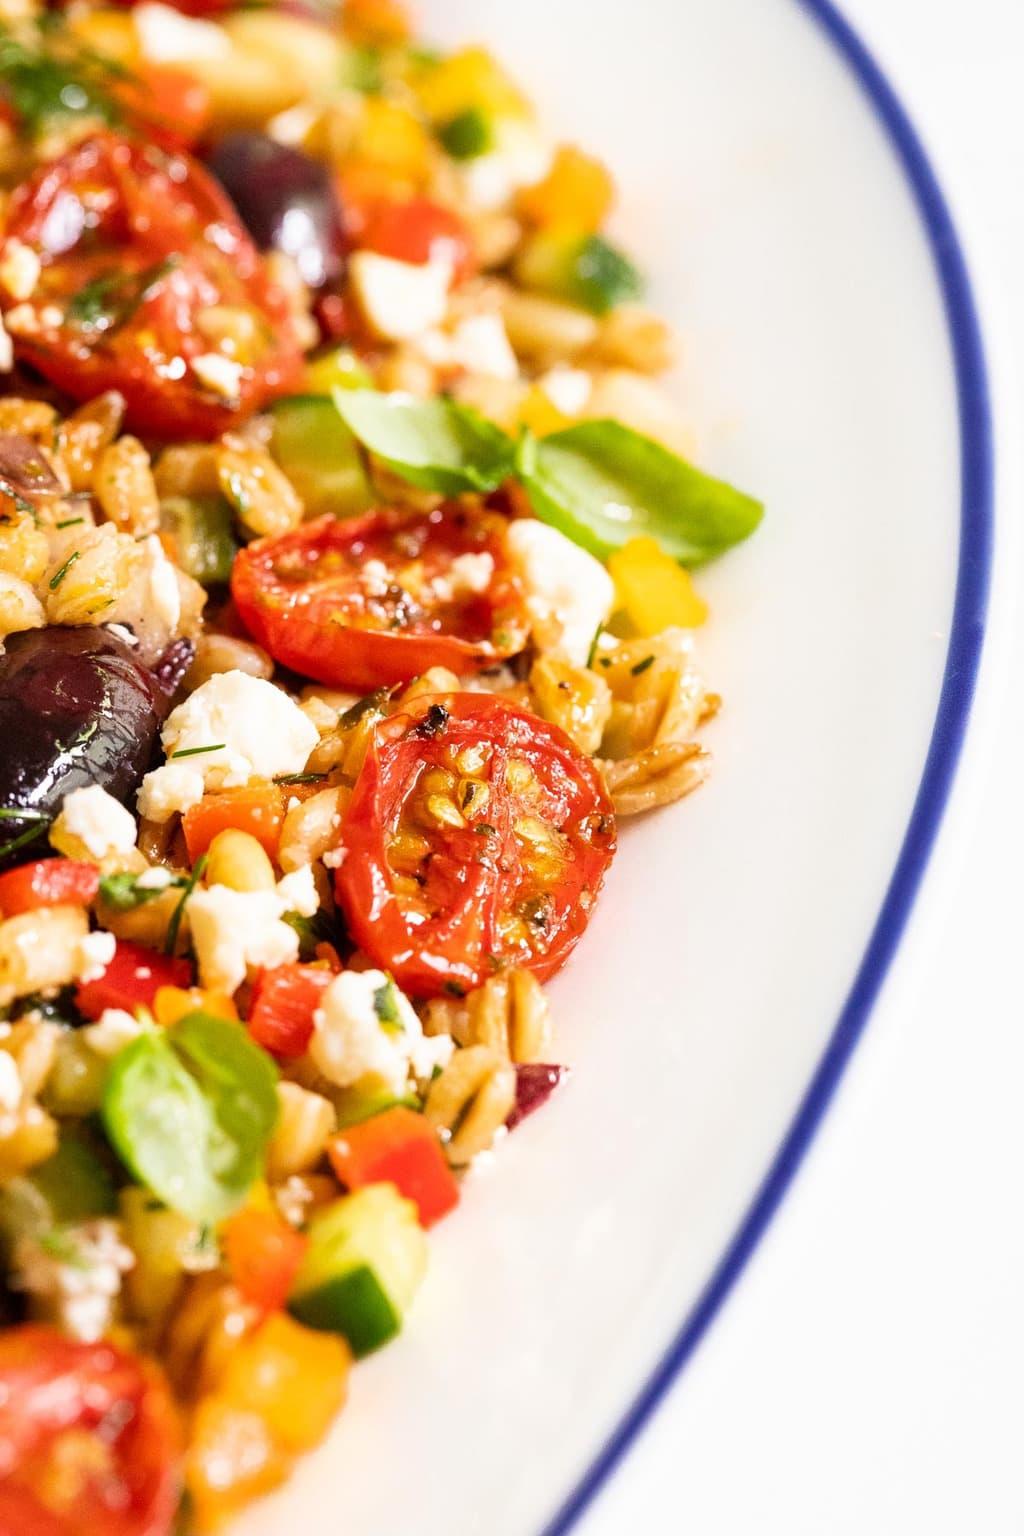 Vertical closeup photo of a Chopped Mediterranean Farro Salad in a white serving platter with blue trim.